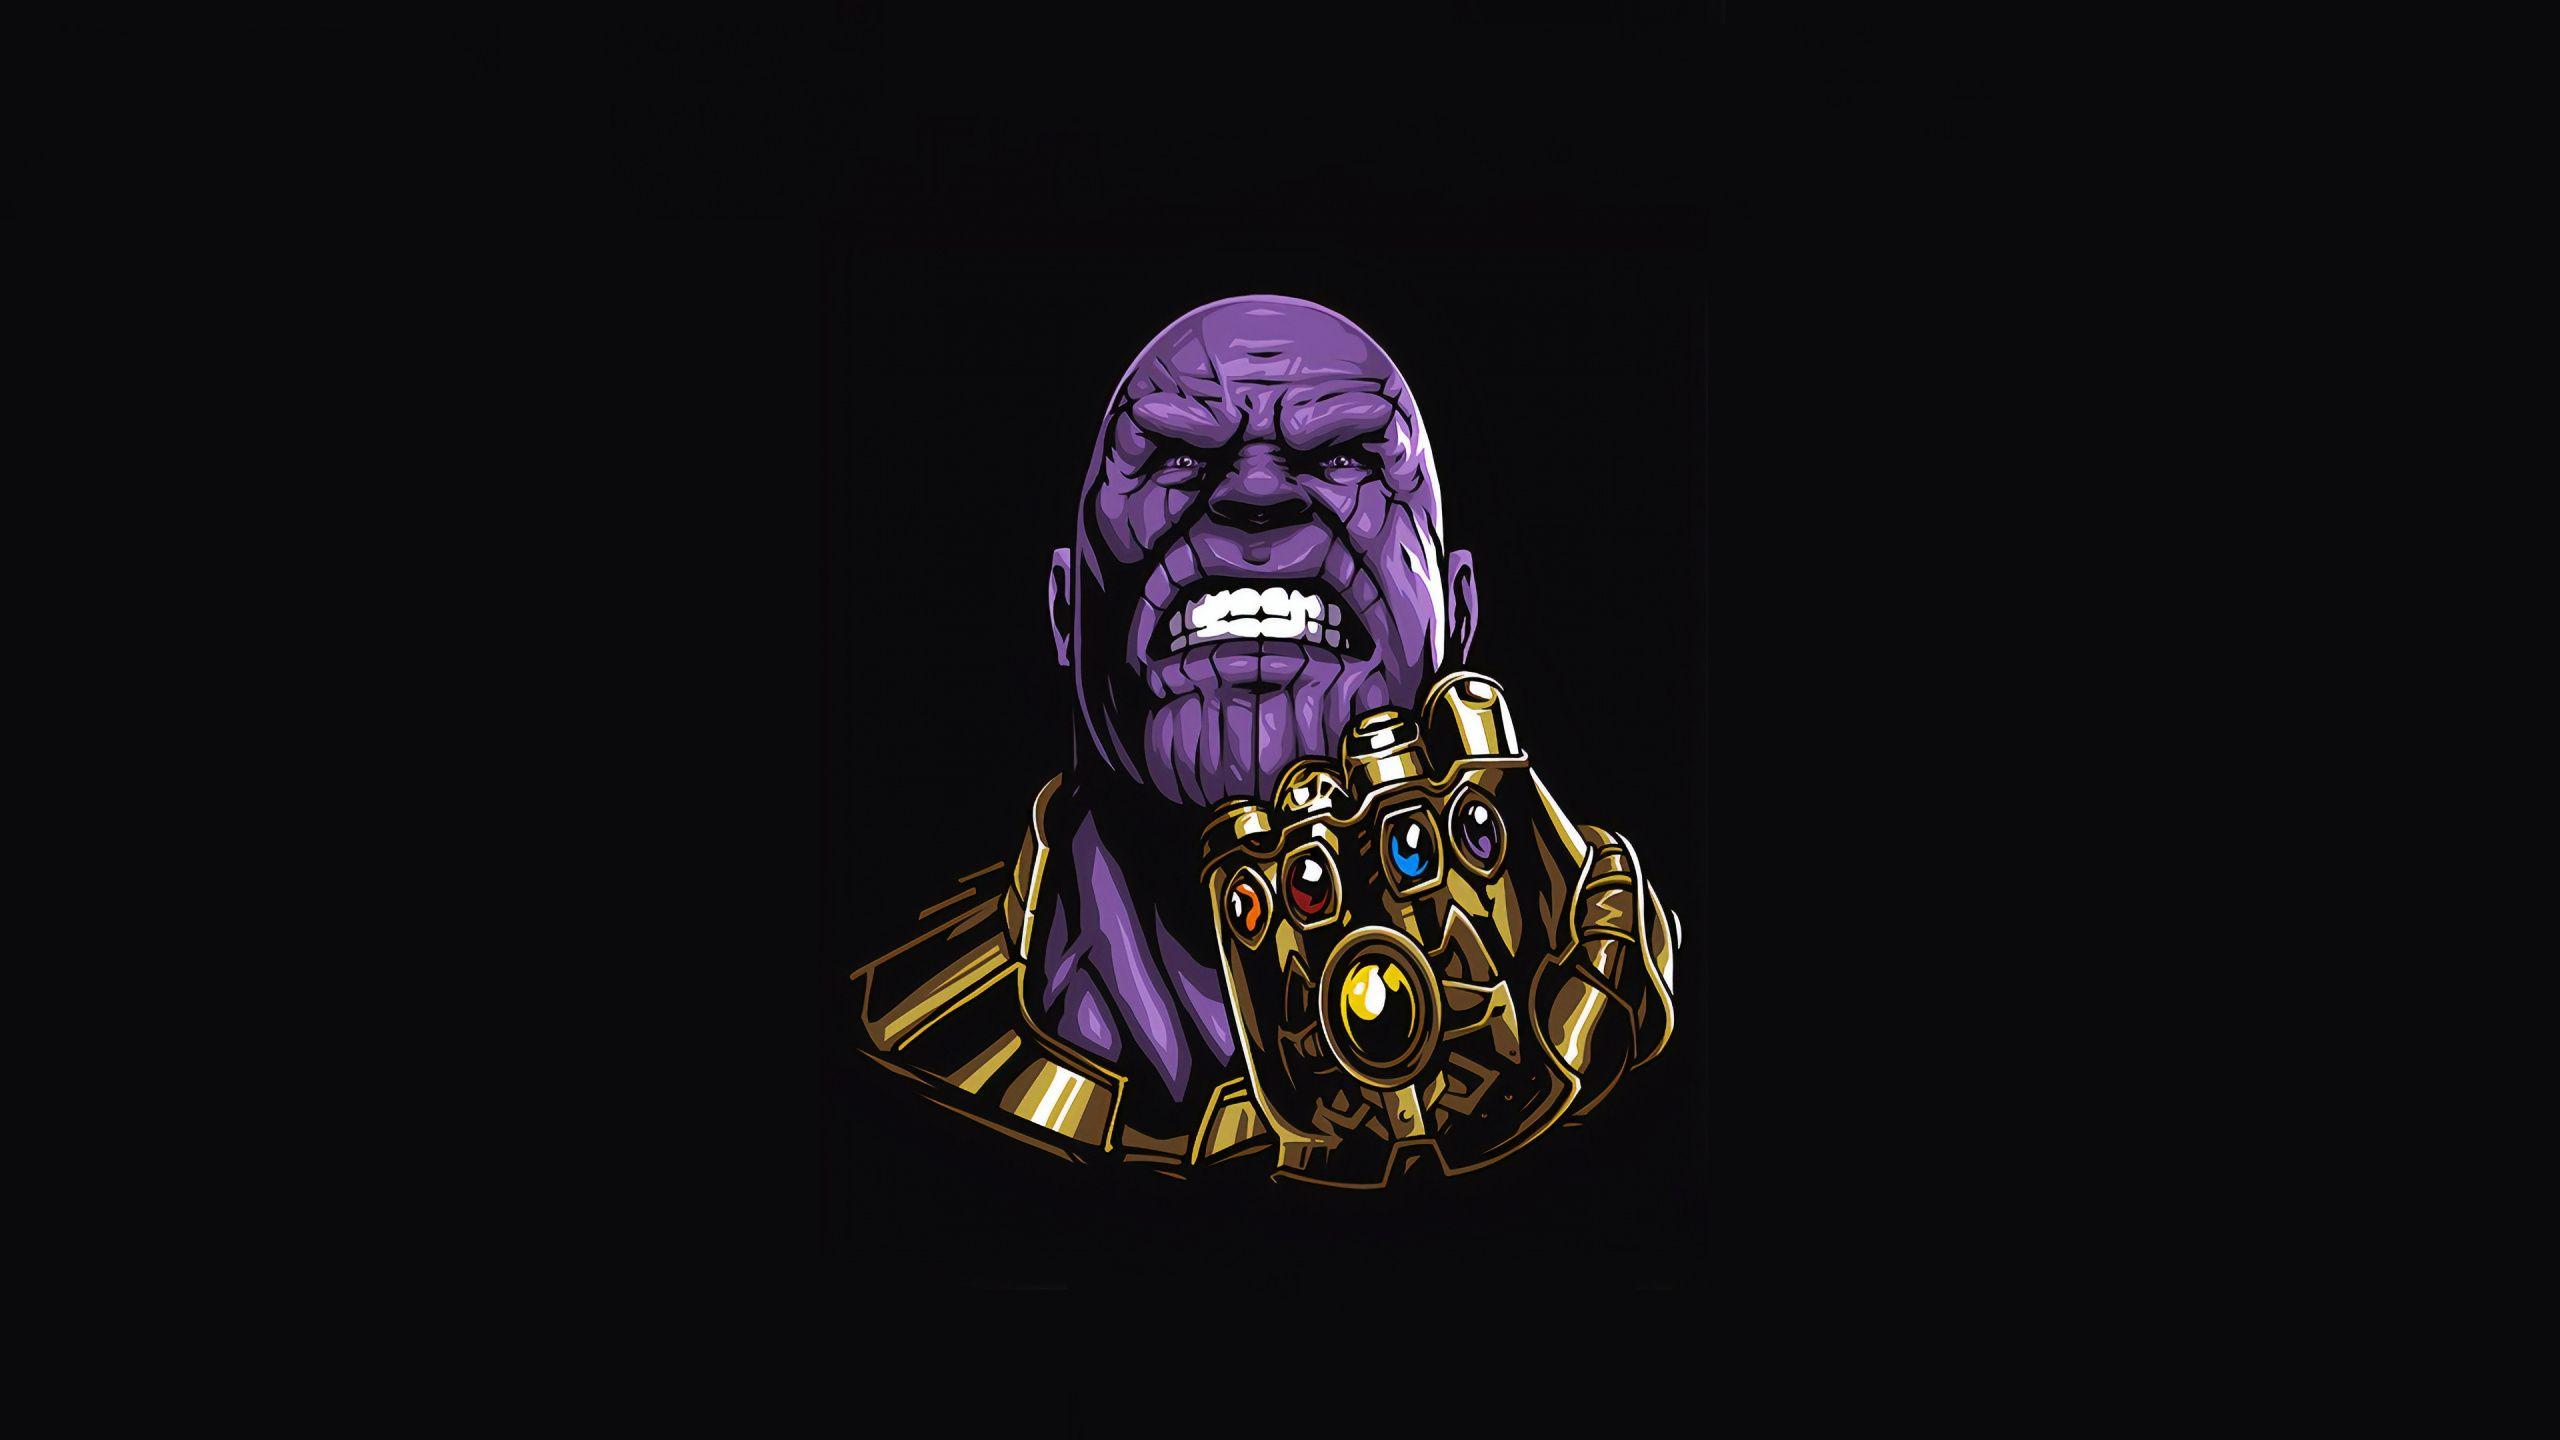 2560x1440 Thanos Super Villain Minimal Art Wallpaper Art Wallpaper Art Super Villains